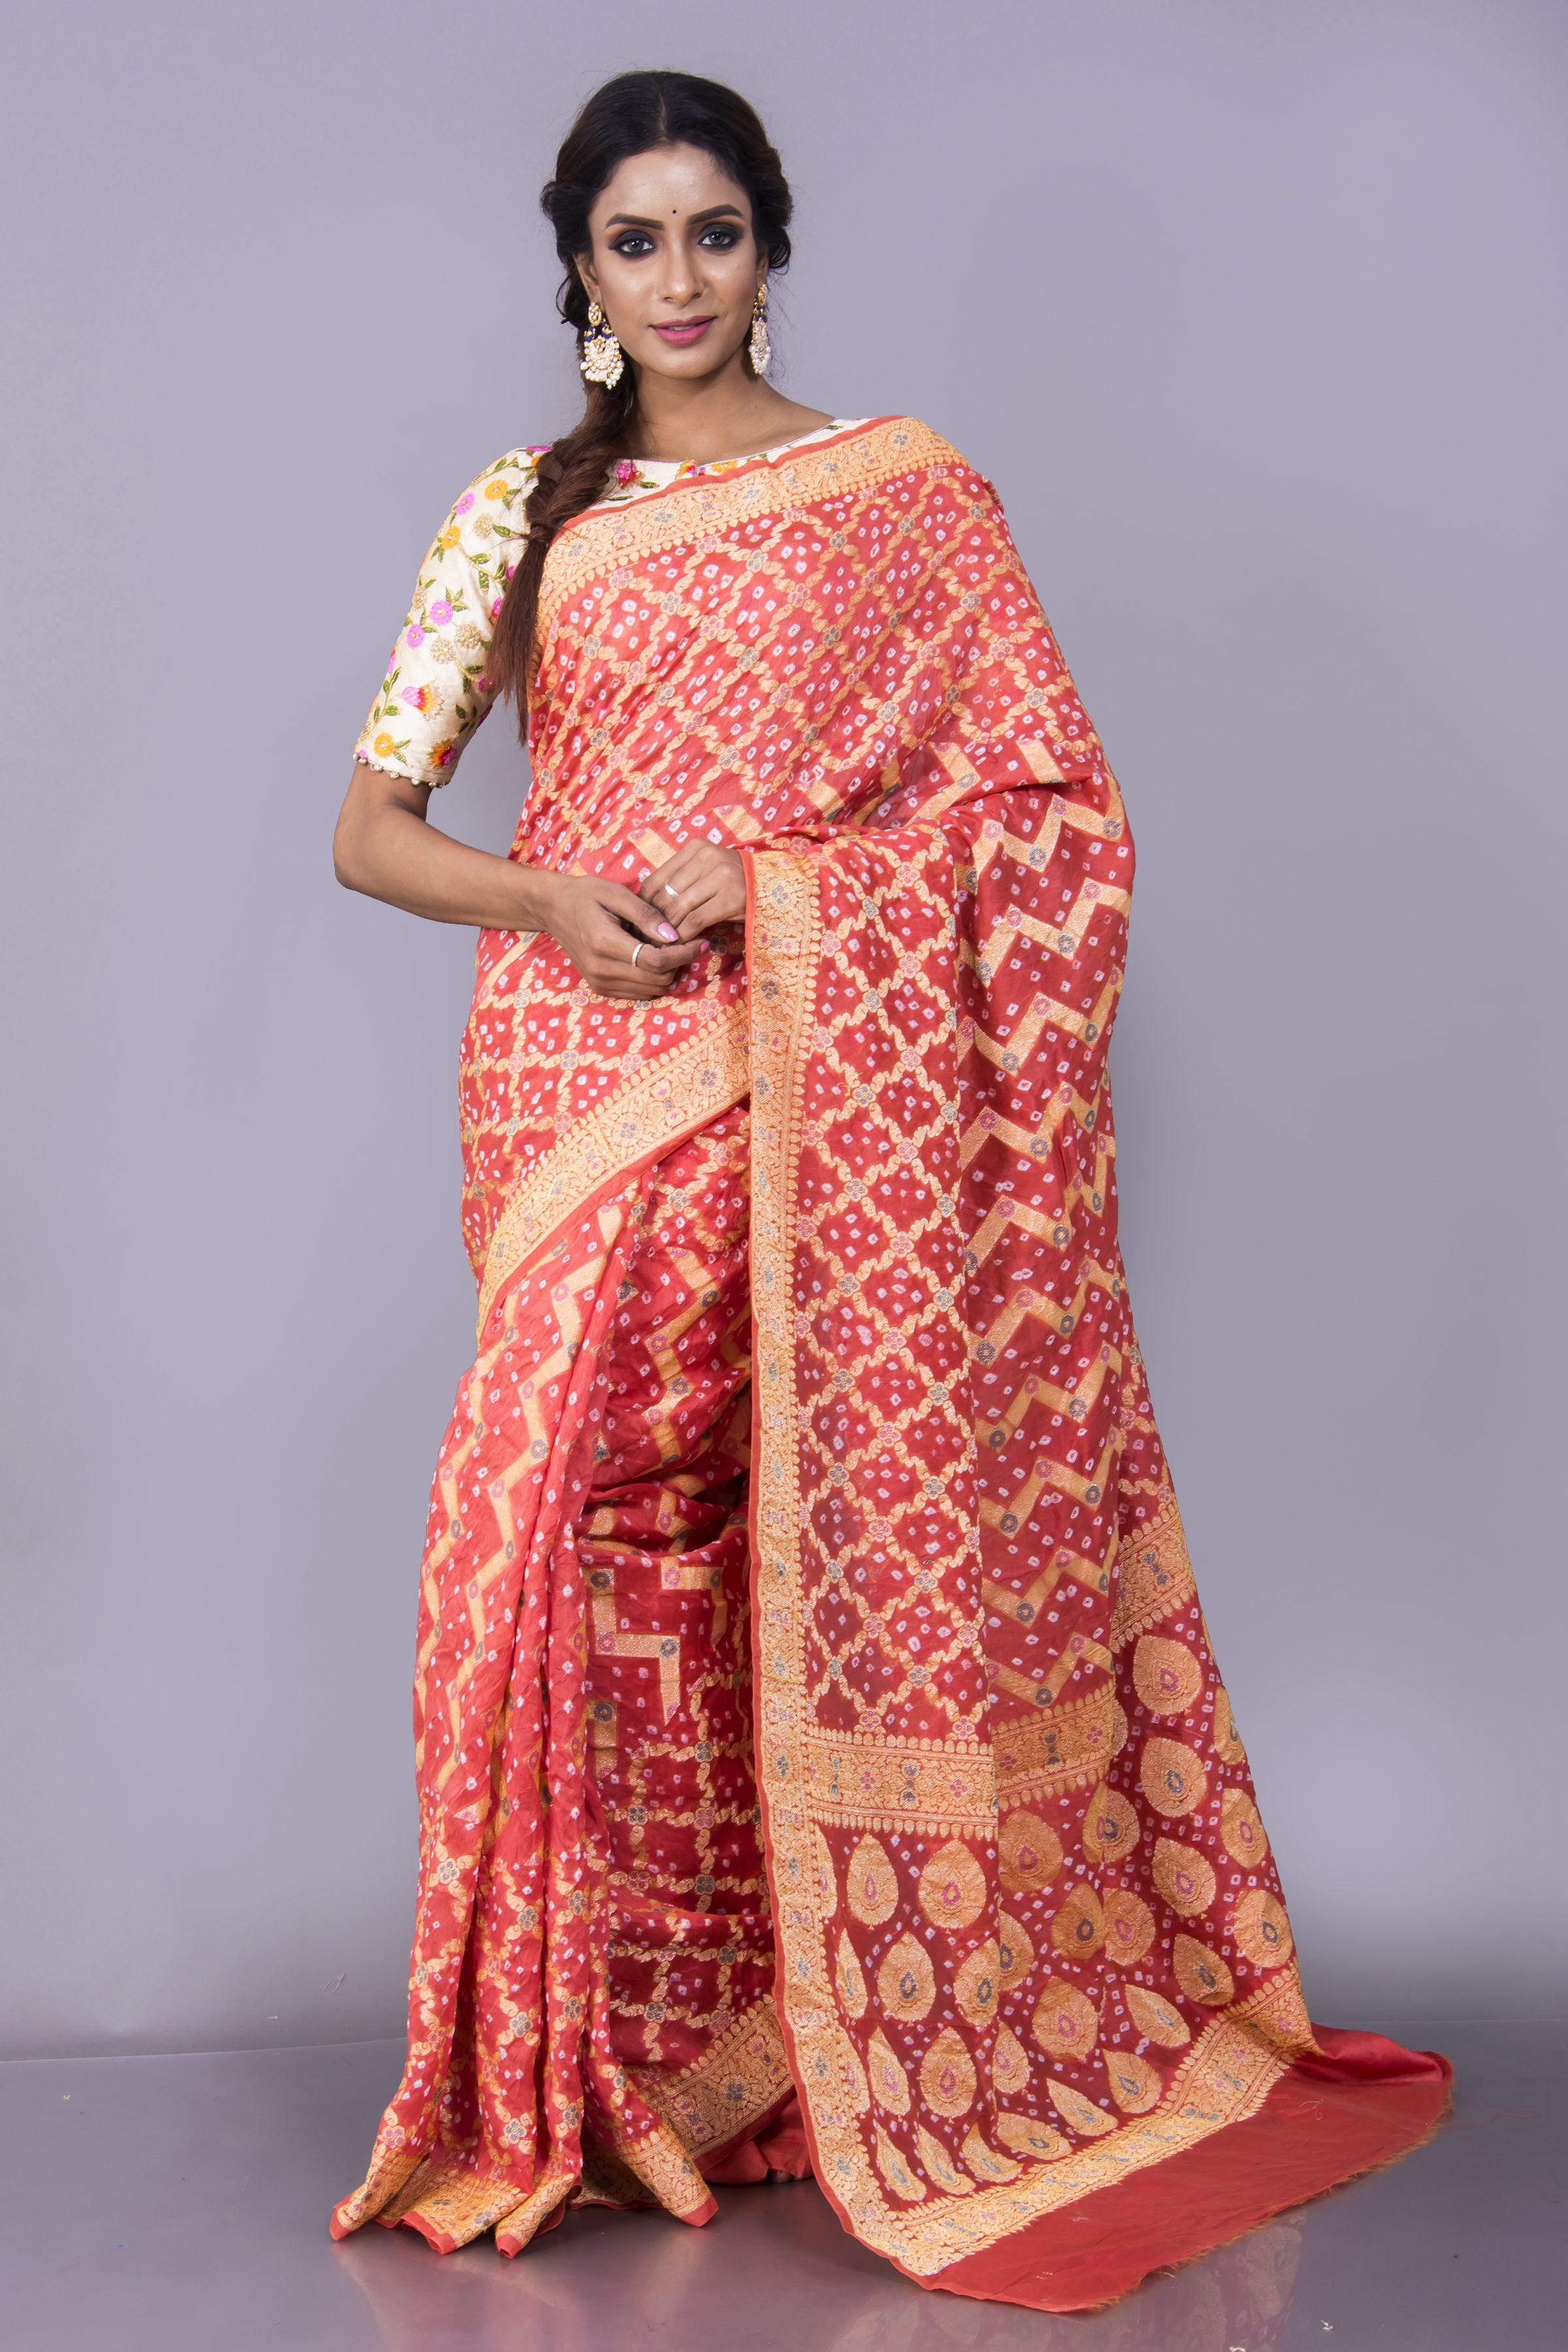 Pure Cotton Bandhani Banarasi Saree in Rust and Gold